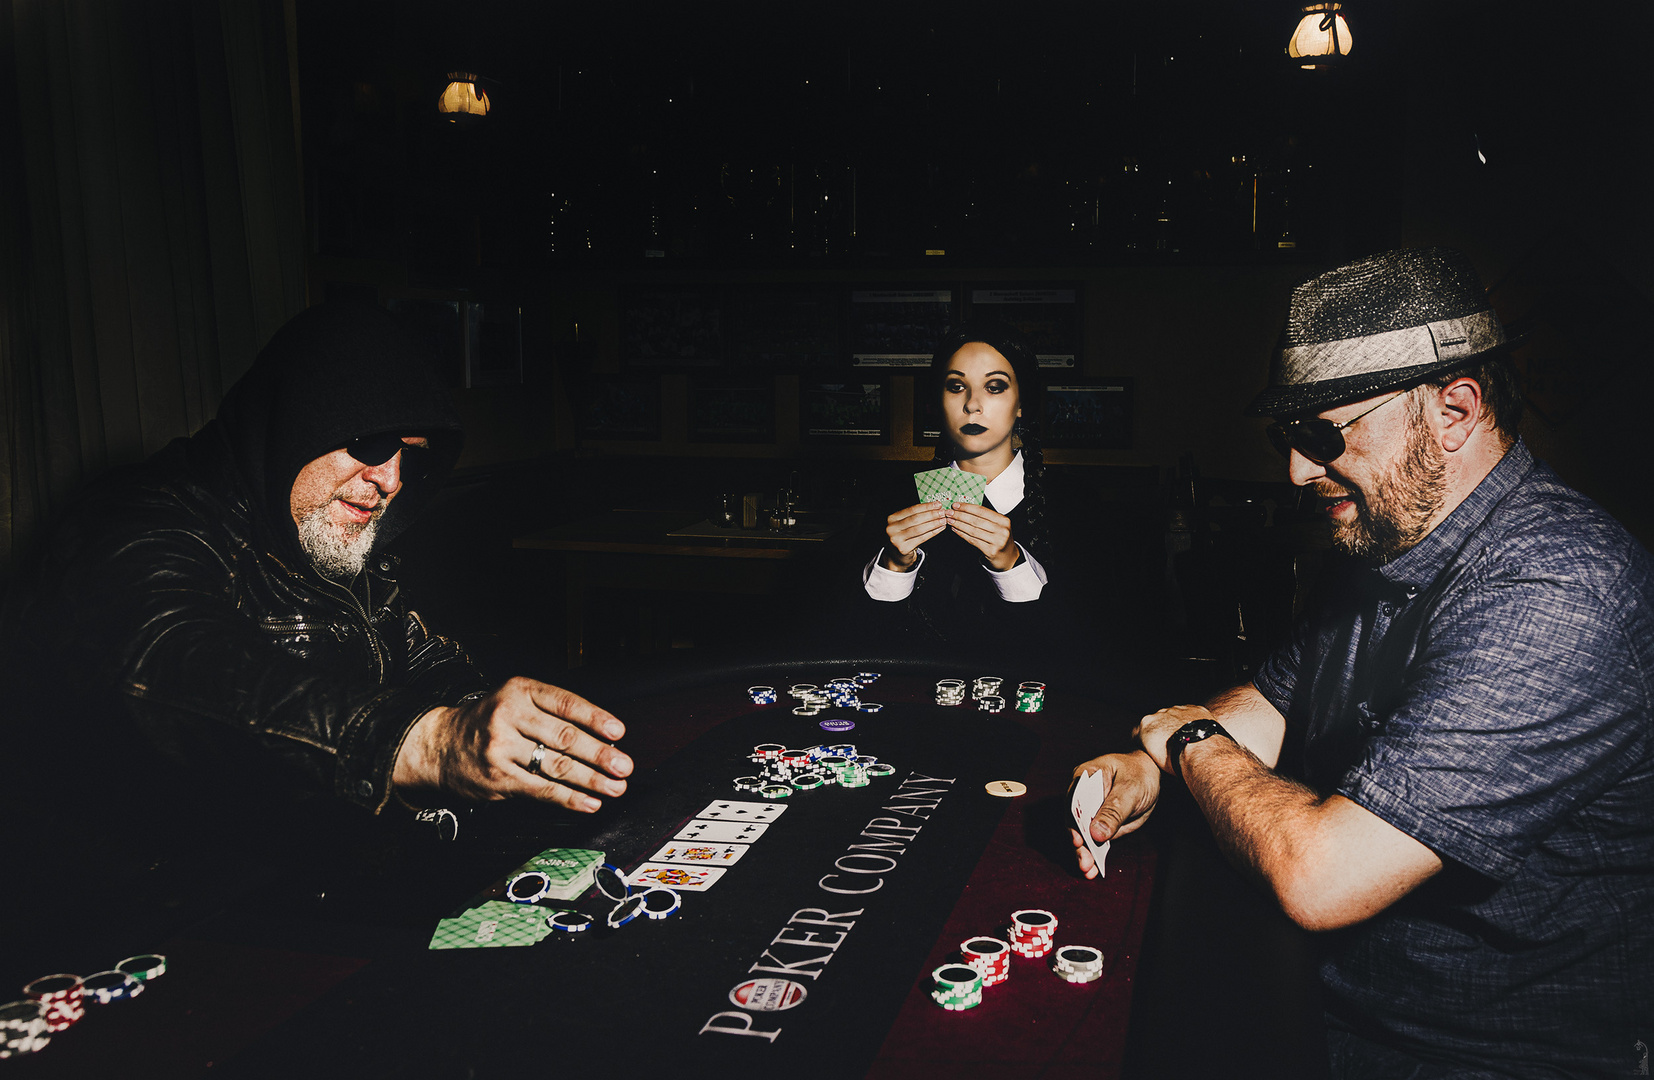 Wednesday Addams Poker Story °1/3